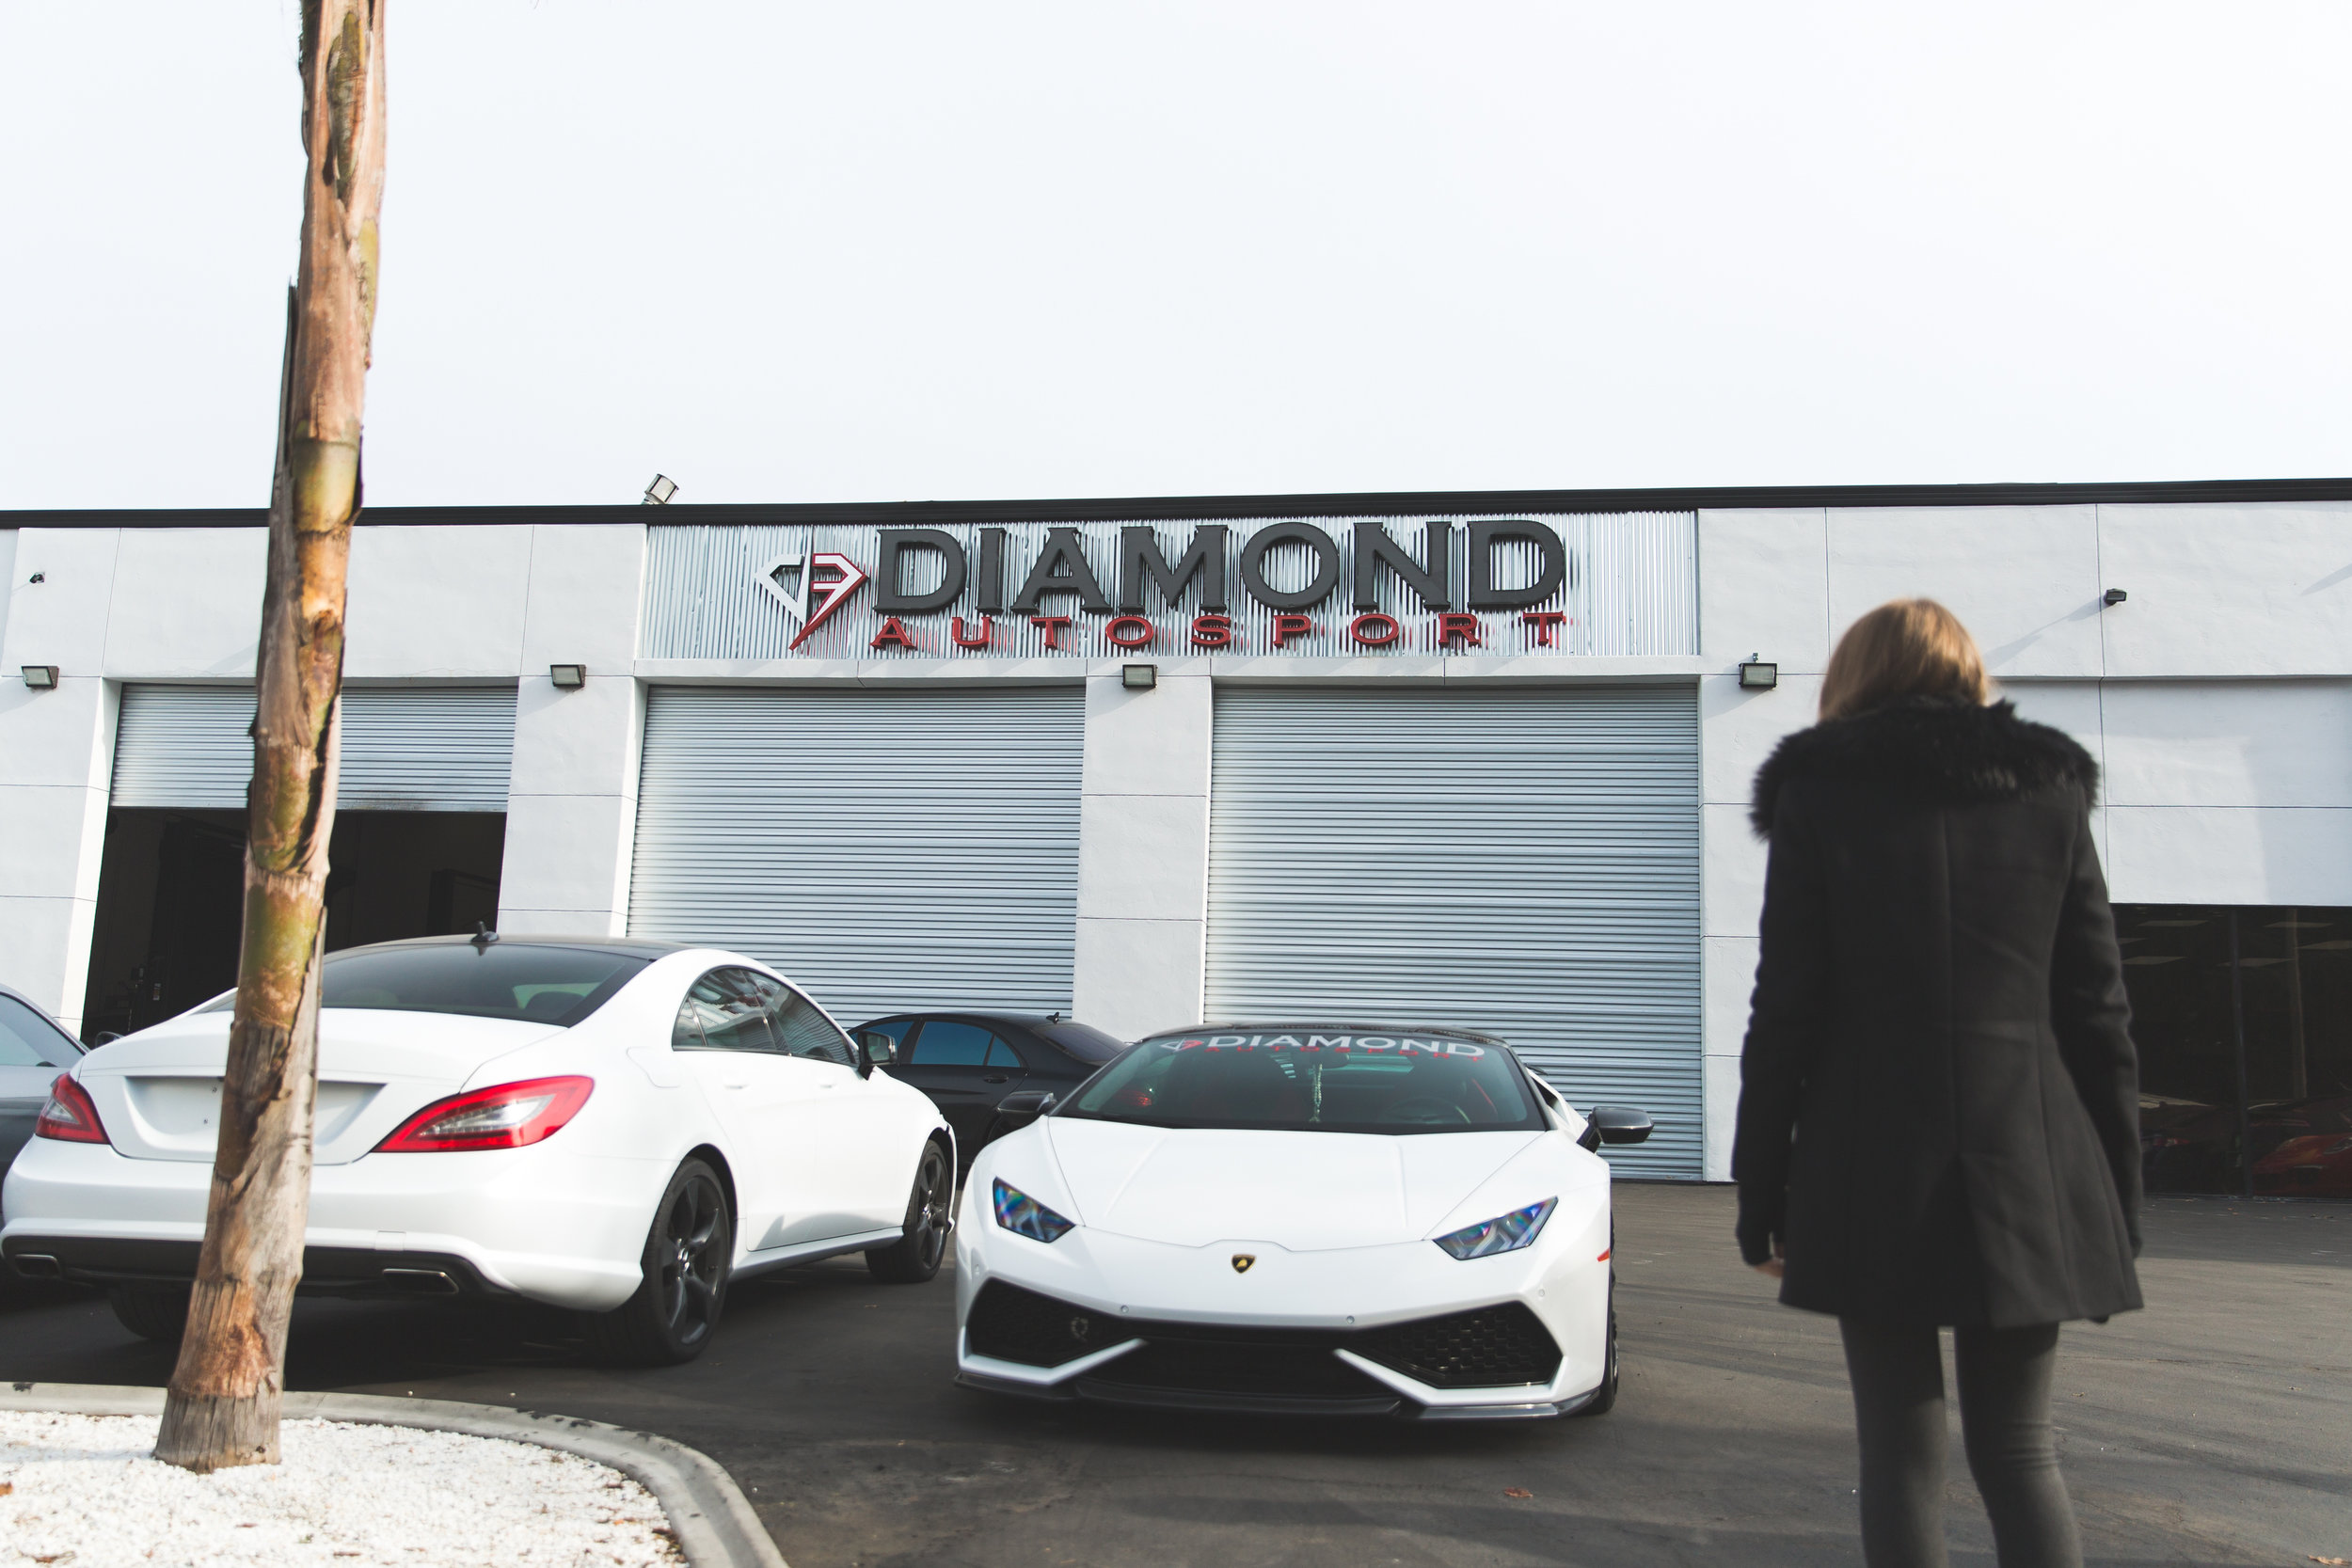 Stay_Driven_Sacramento_Diamond_Autosport-1.jpg